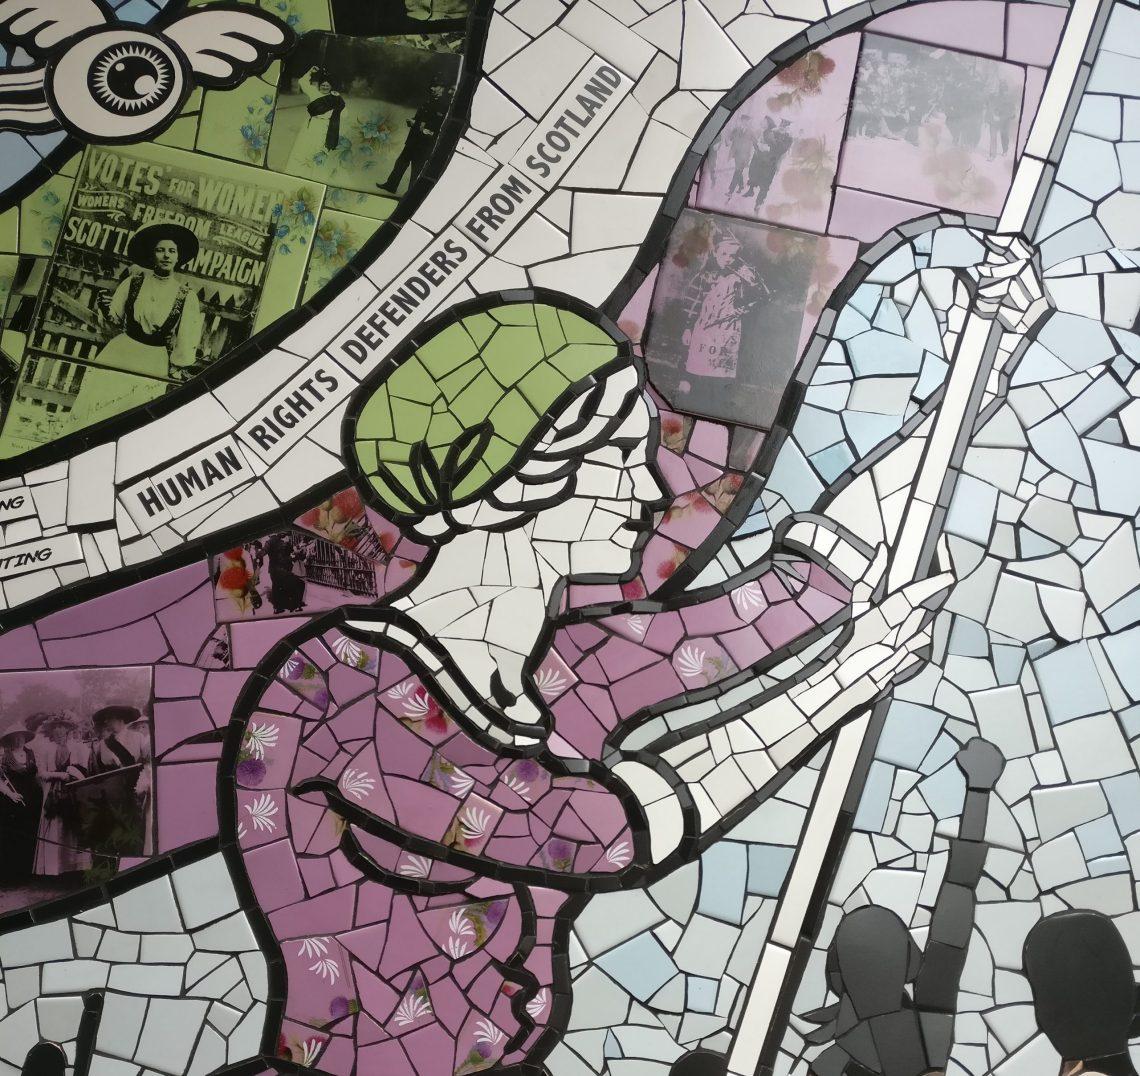 suffragette spirit  a mural bycarrie reichardt for nuart aberdeen 2018